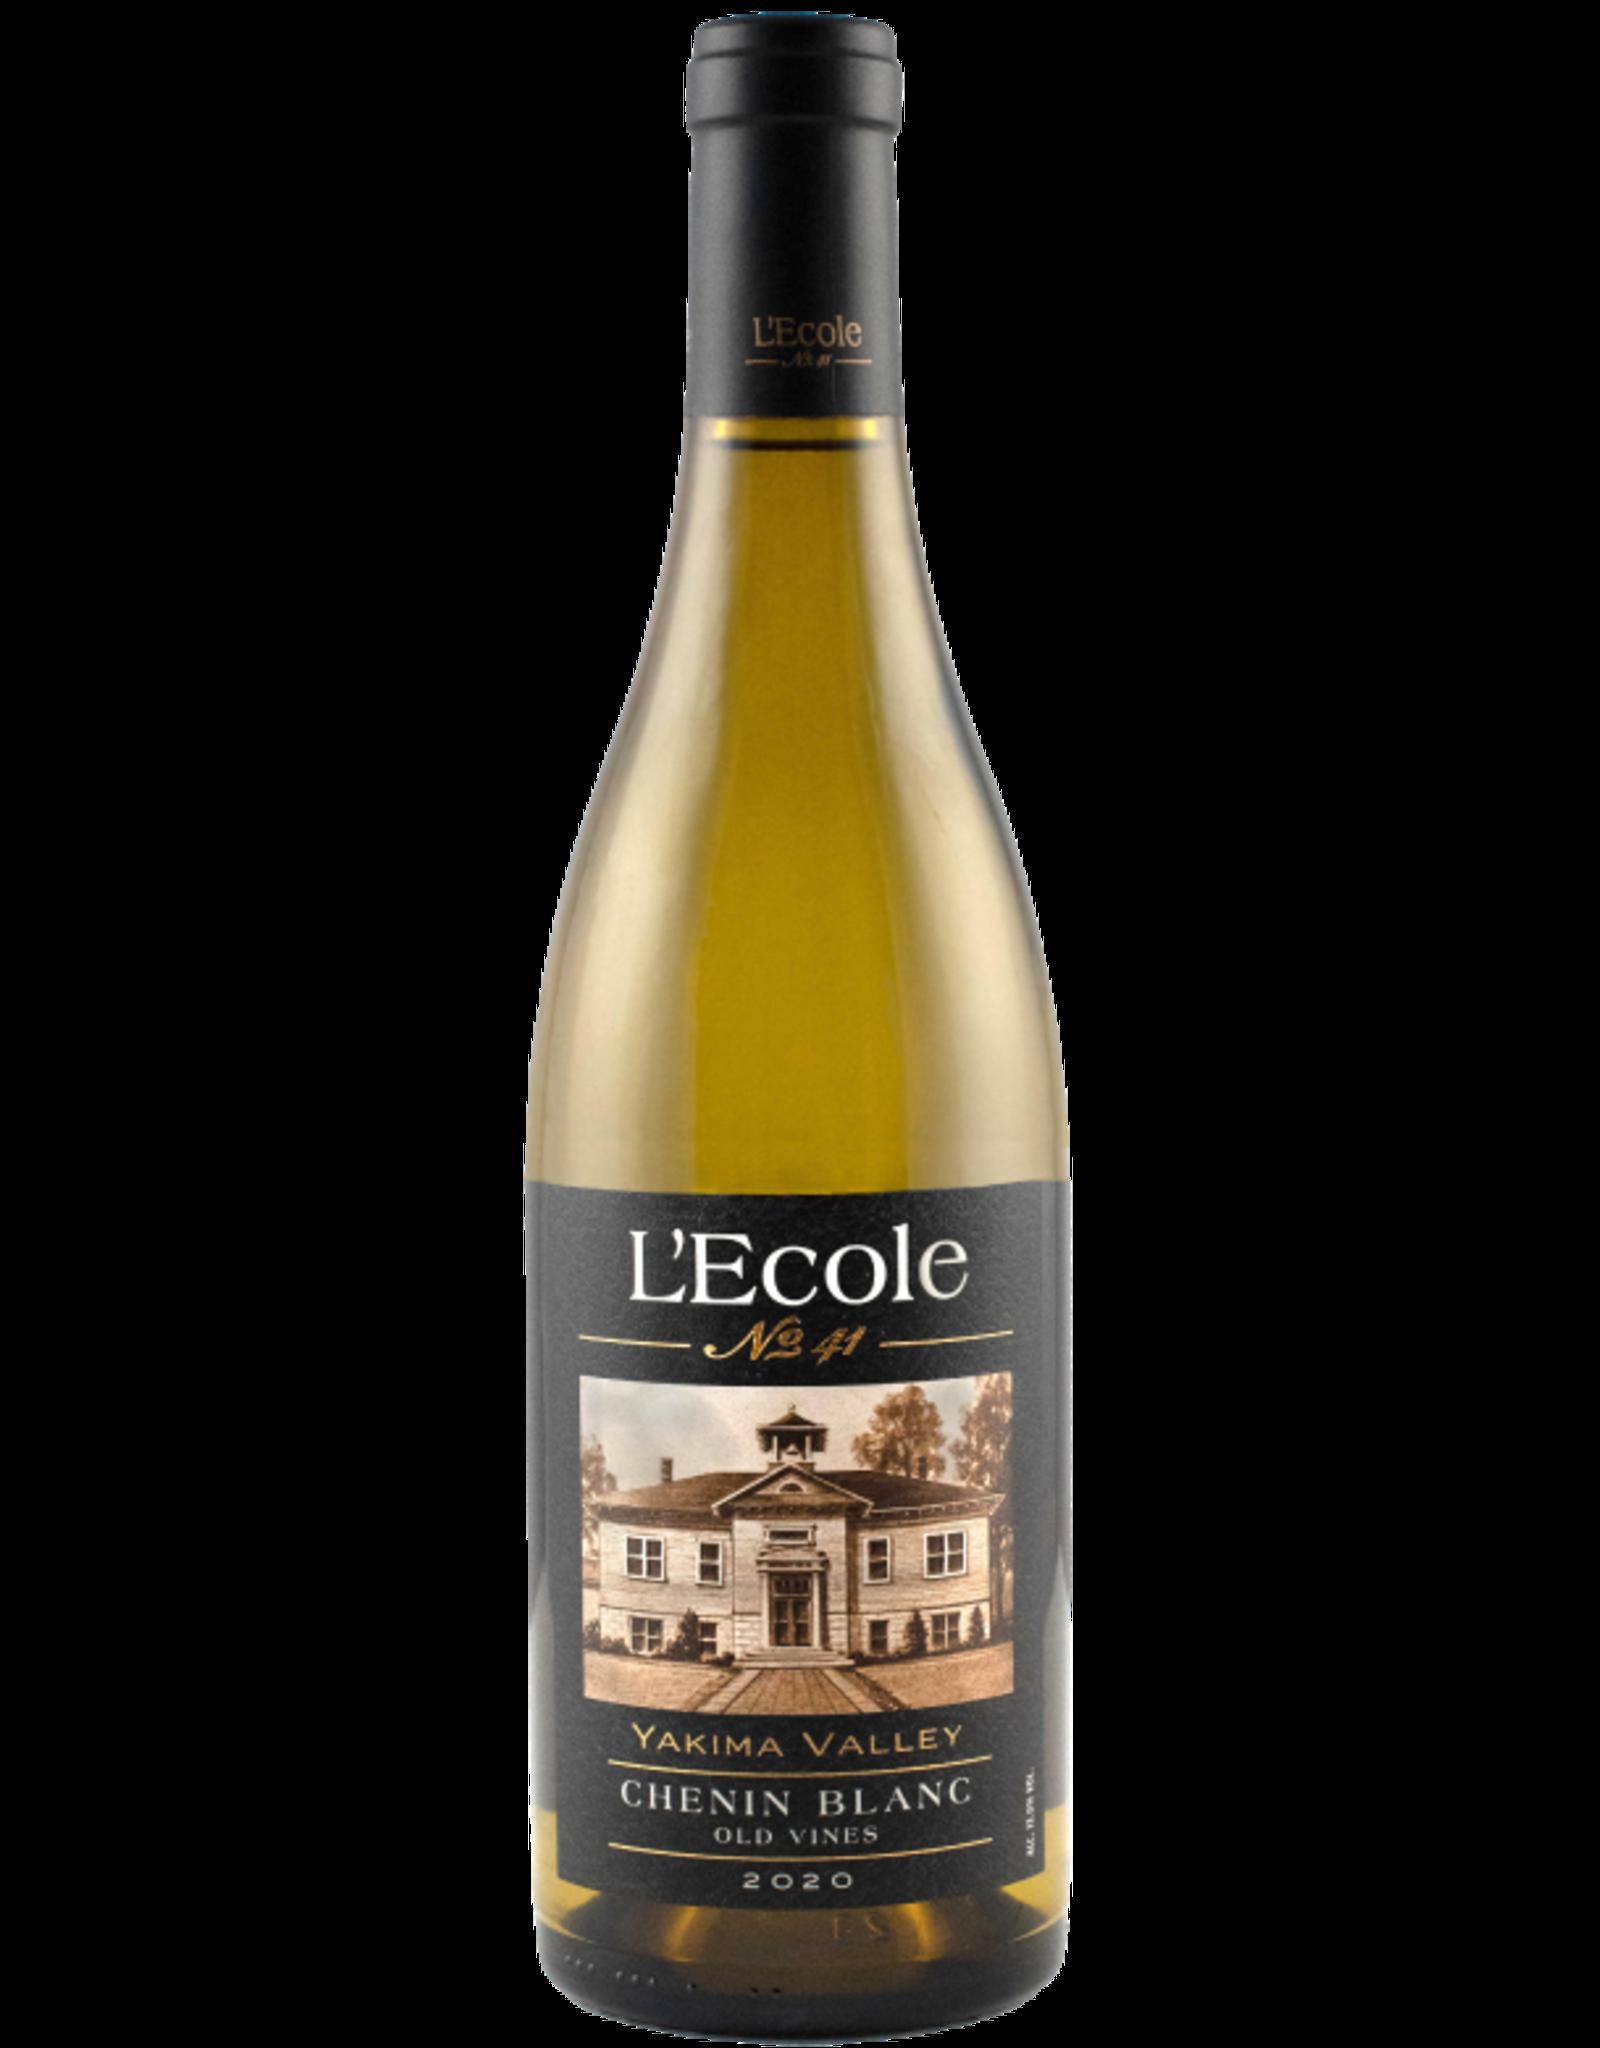 "L'Ecole L'Ecole No. 41 Chenin Blanc ""Old Vines"" Yakima Valley 2020"